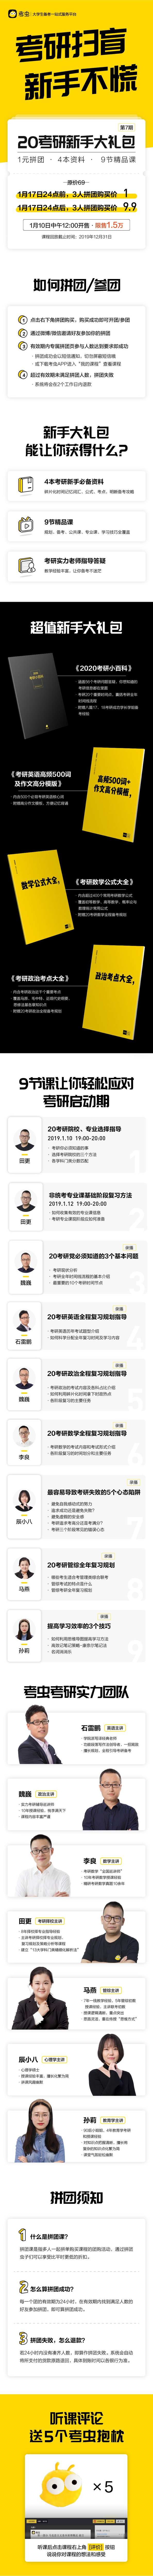 20礼包详情图.png